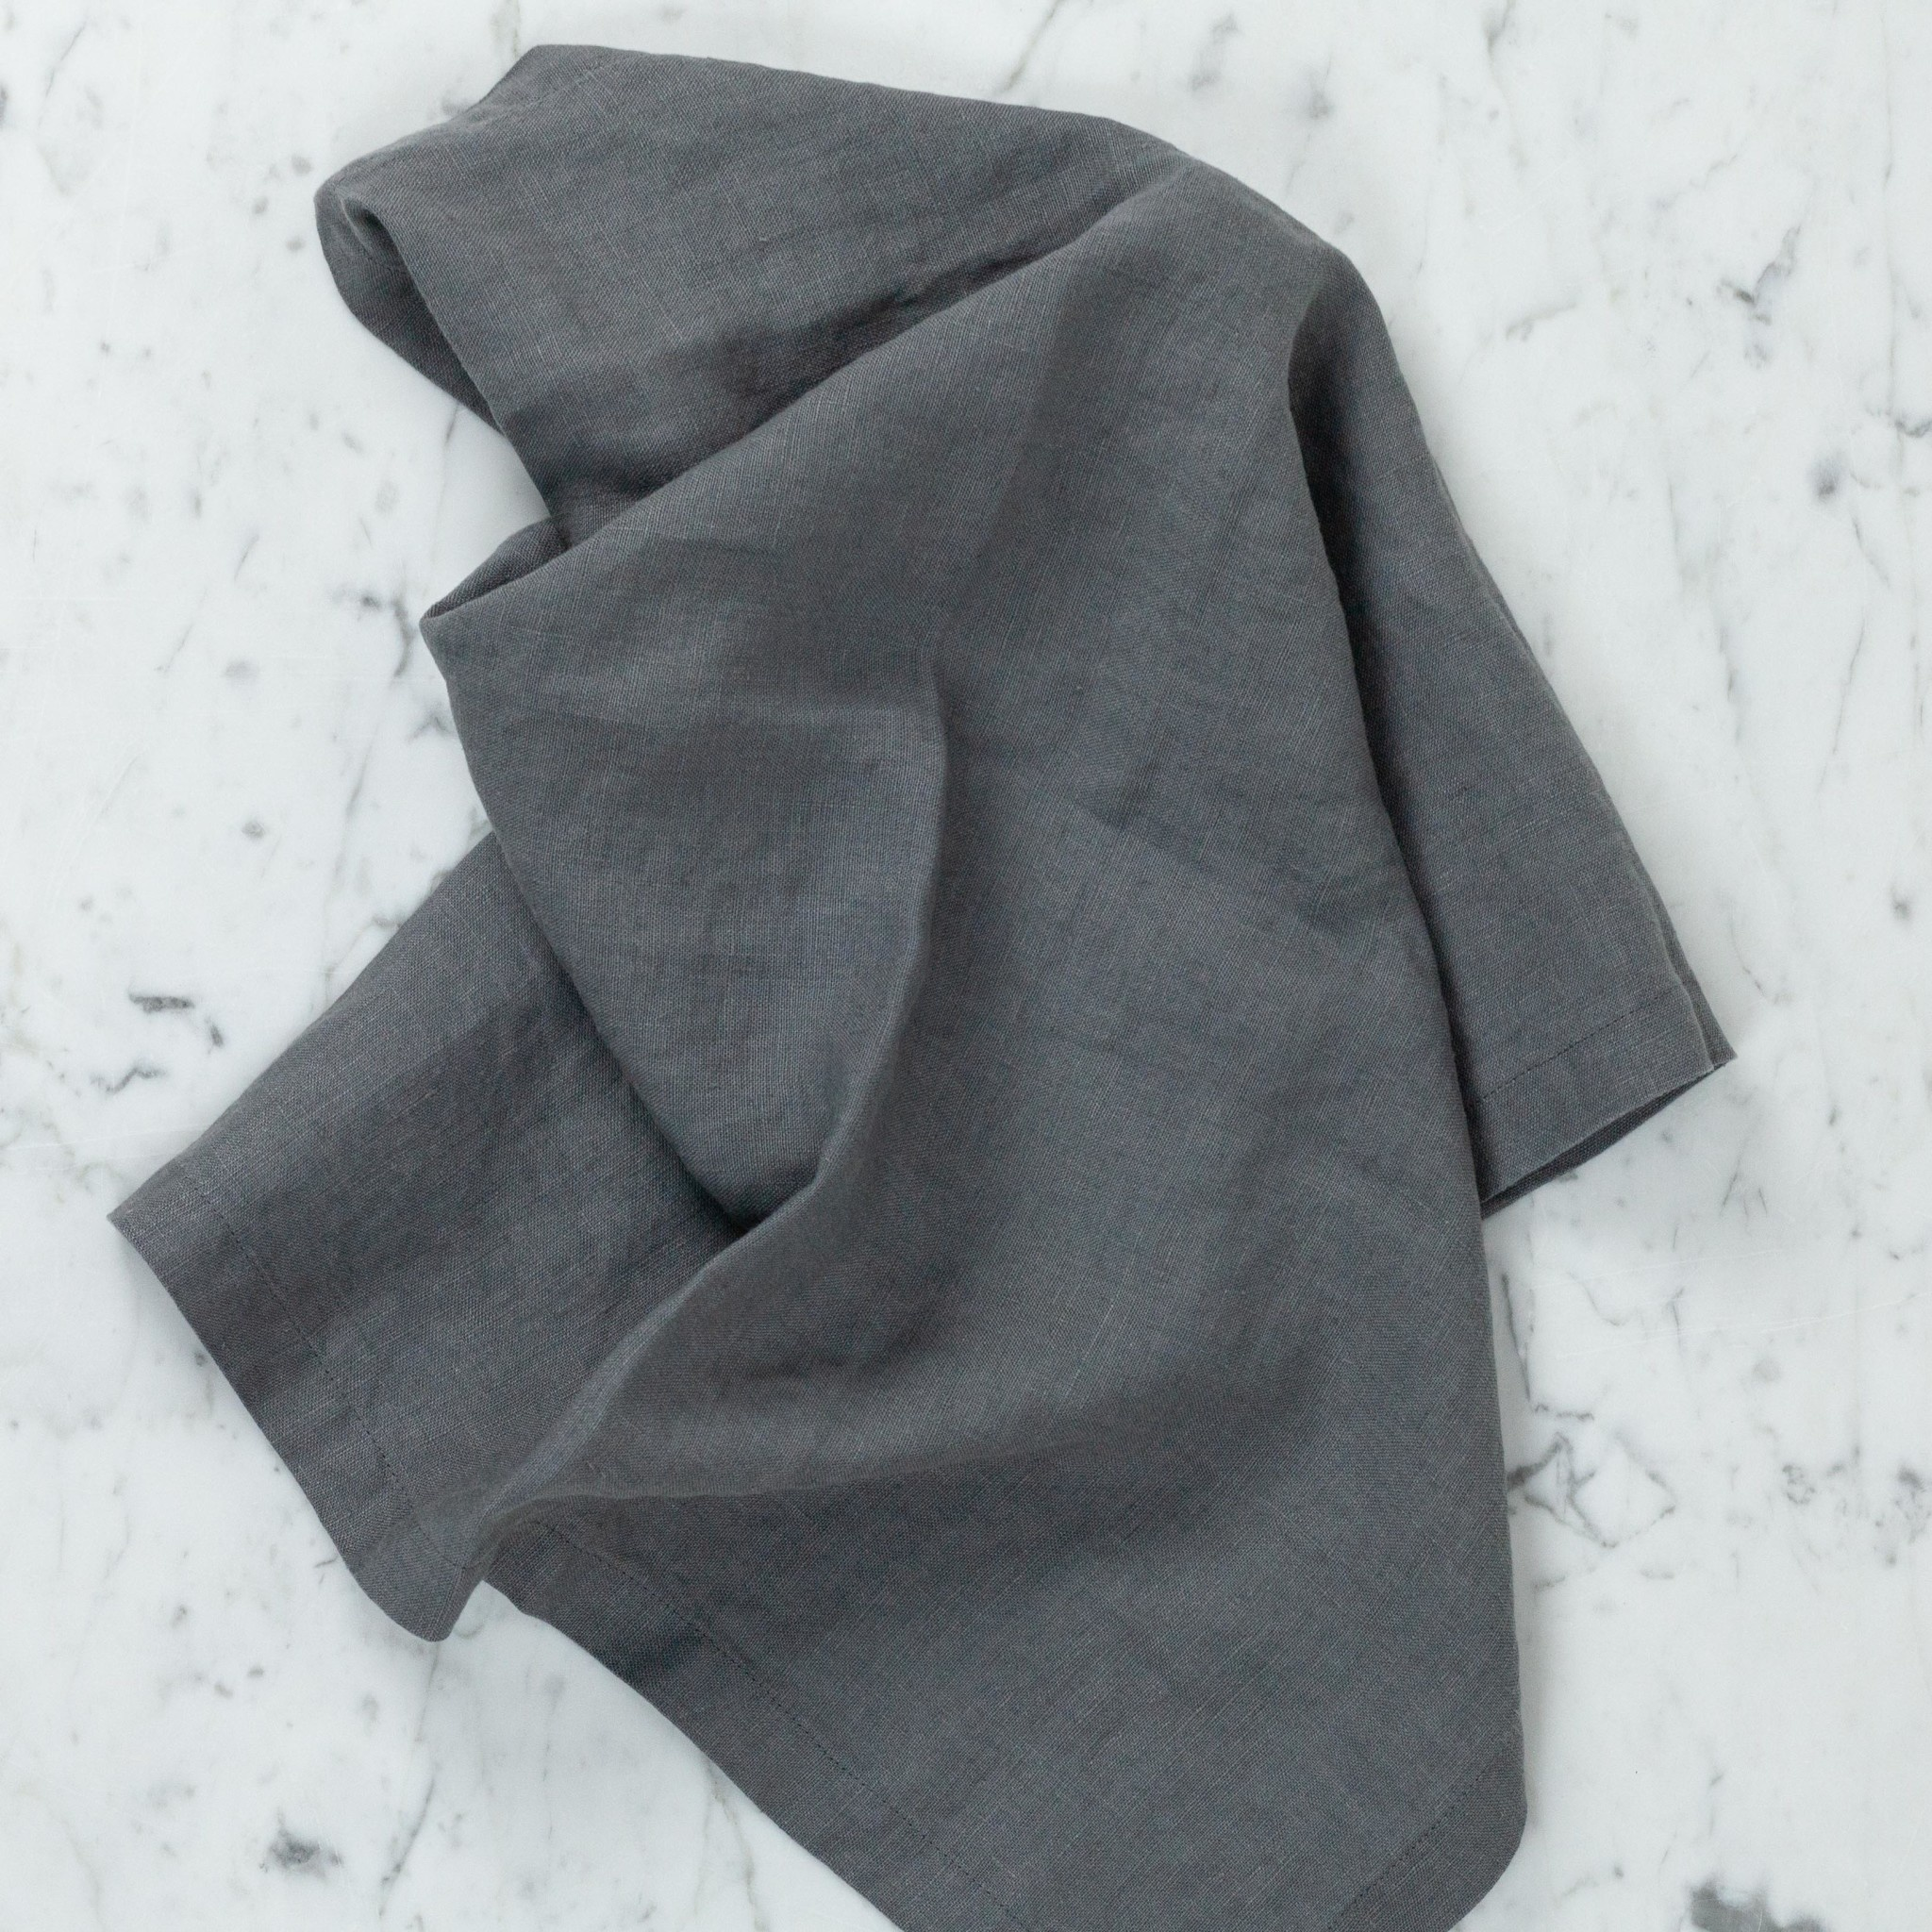 Linen Napkins - Set of 4 - Charcoal Grey